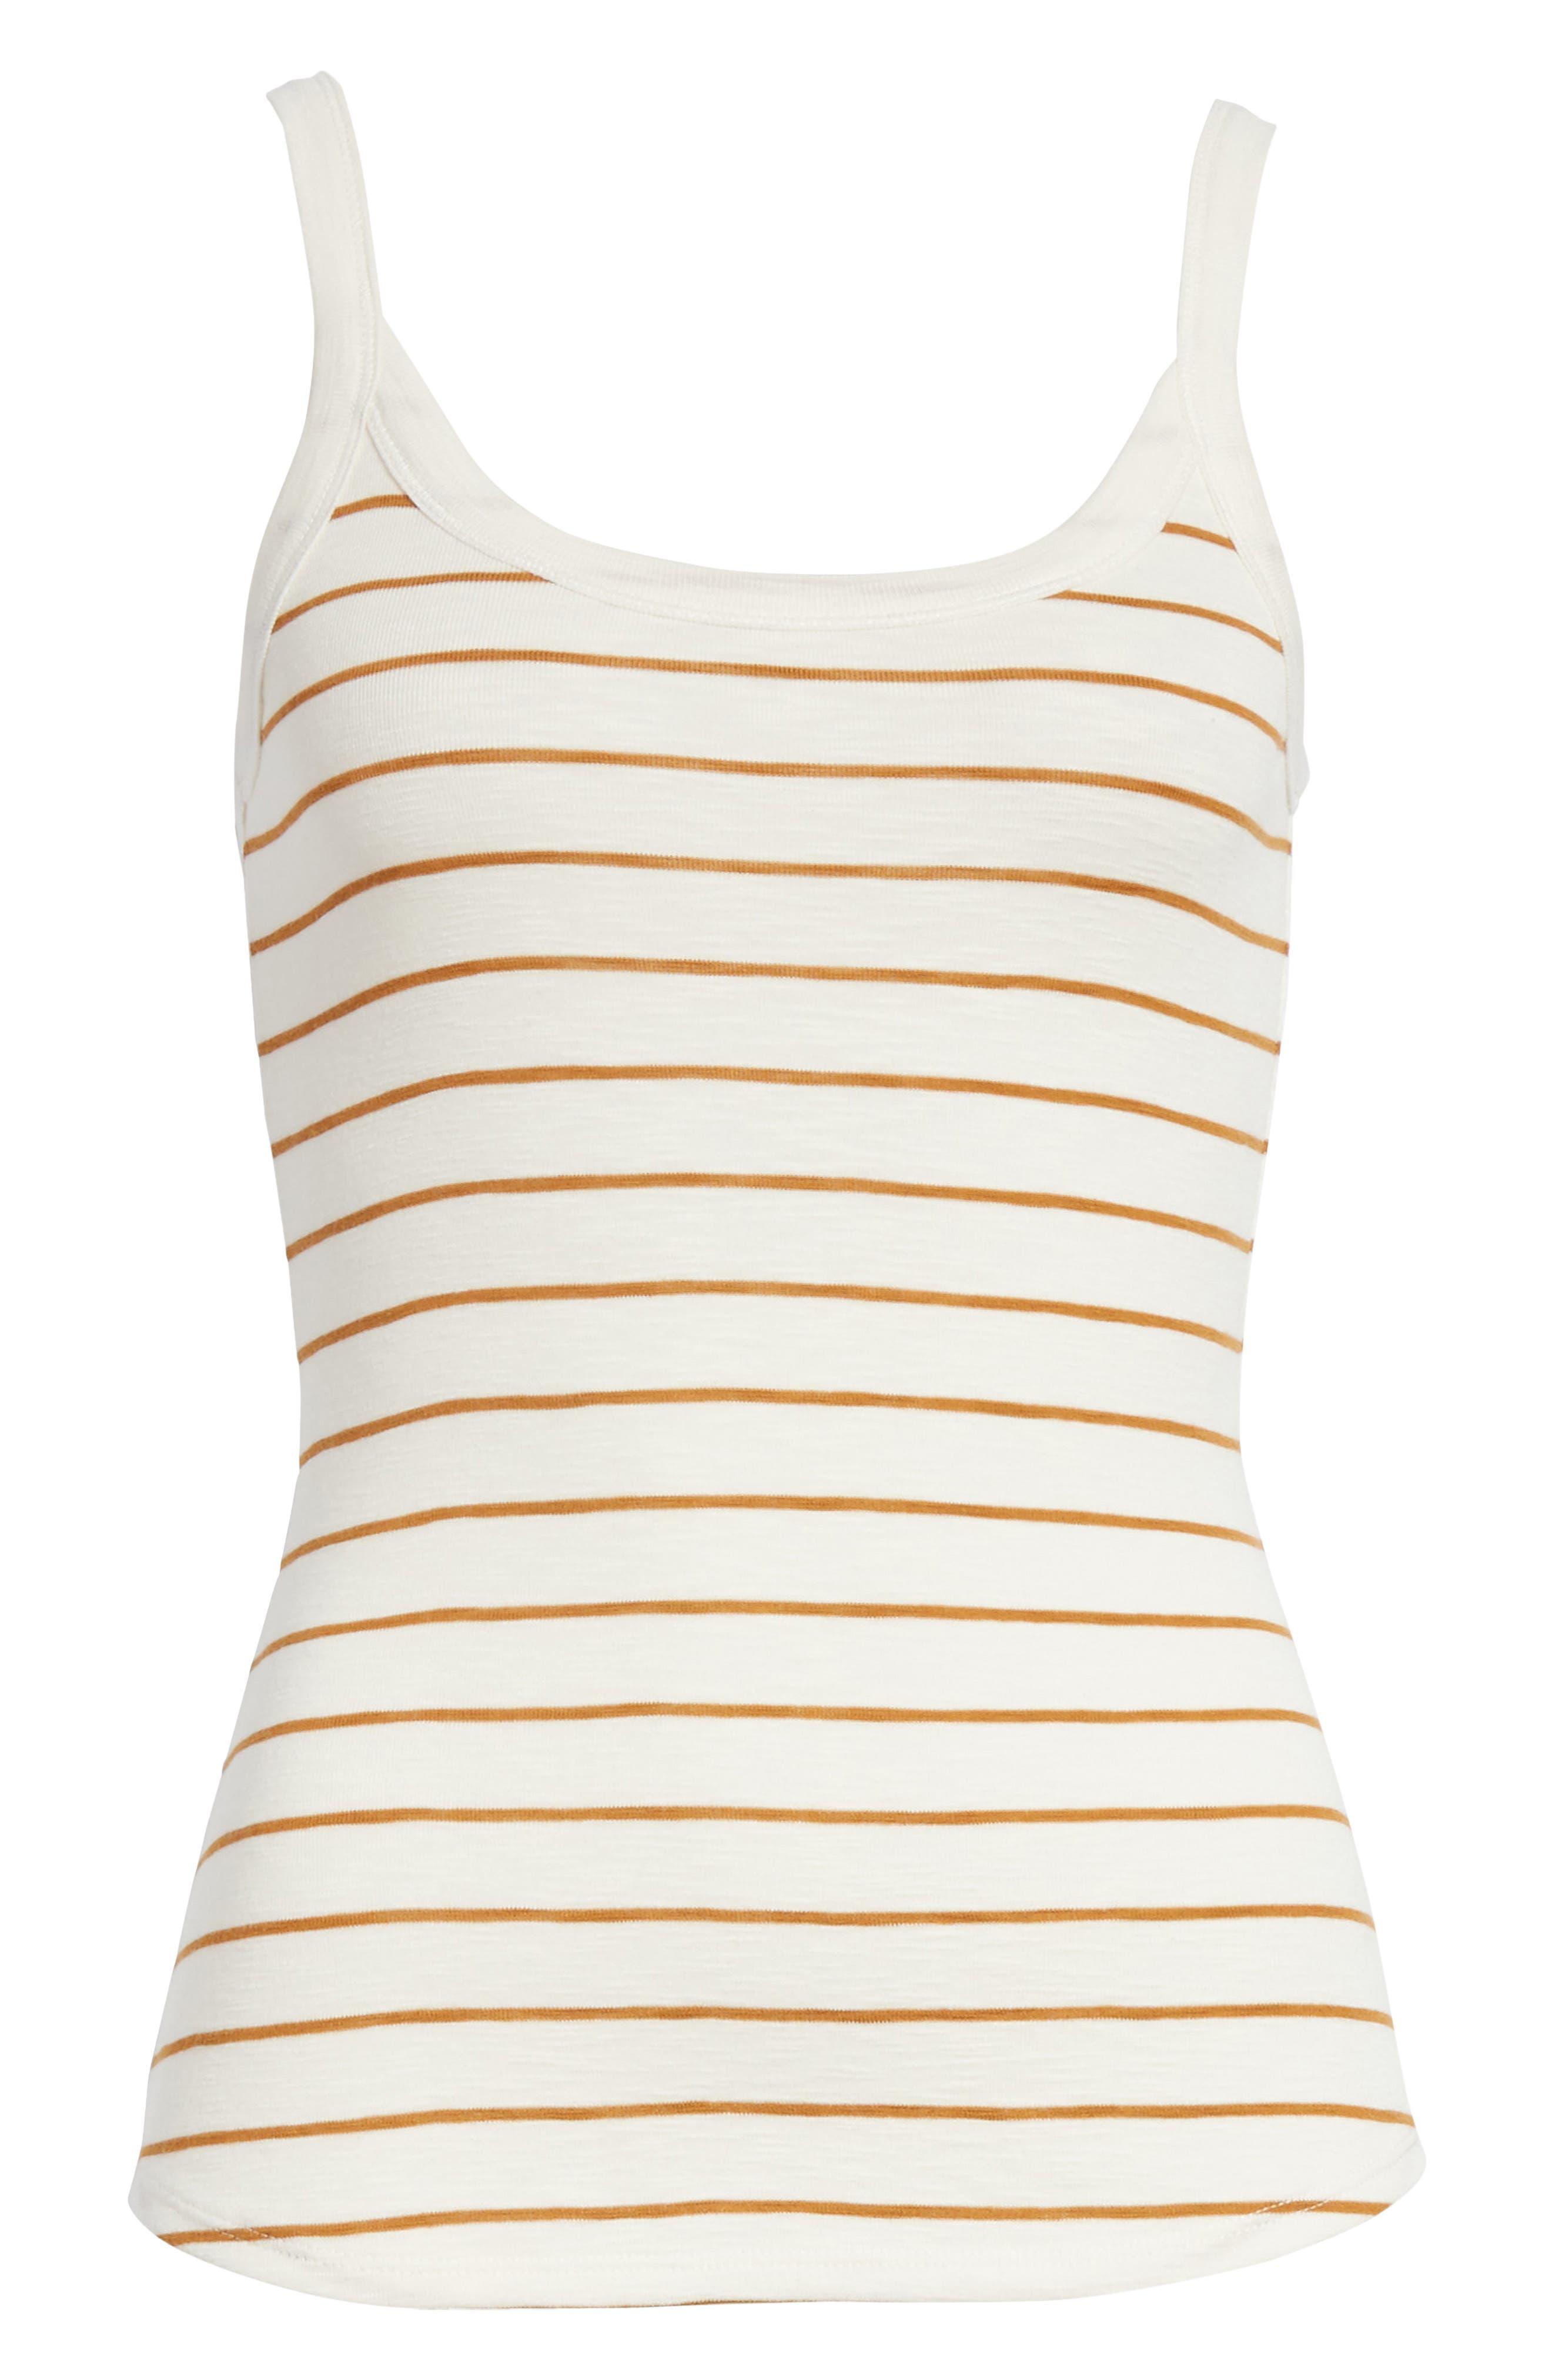 Scoop Neck Stripe Camisole,                             Alternate thumbnail 6, color,                             Vanilla/ Turmeric